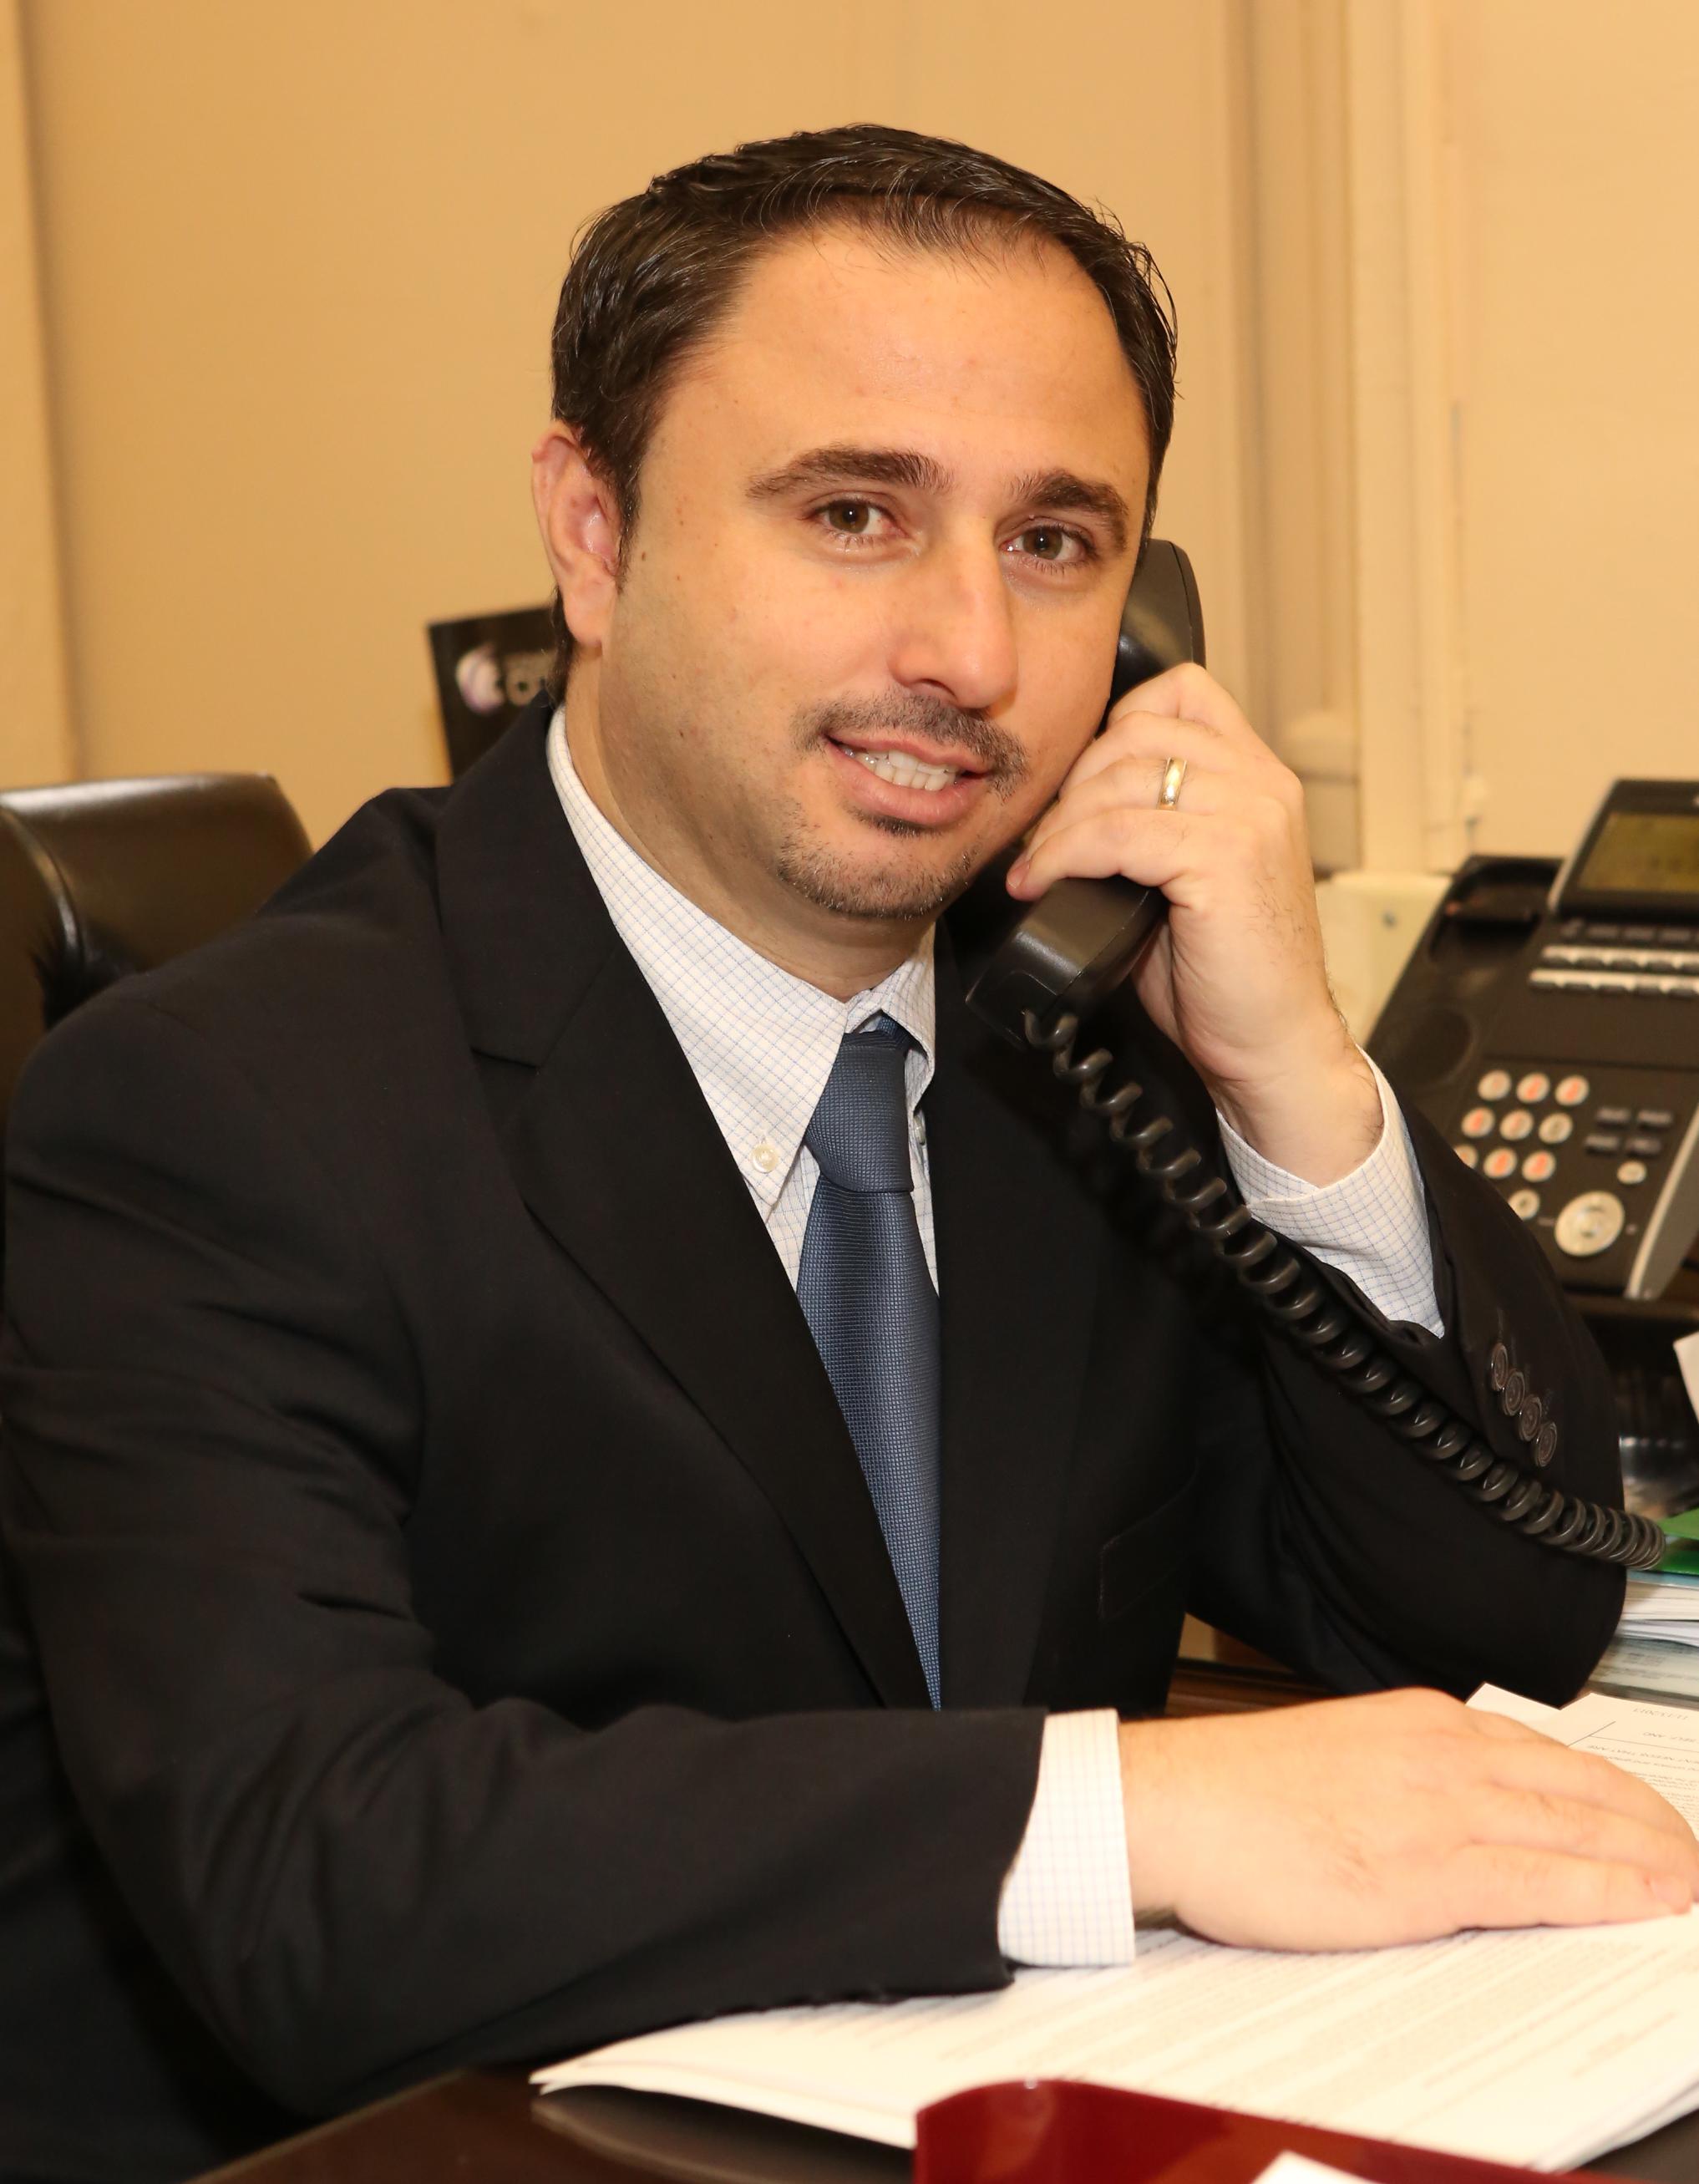 Robert Ciulla